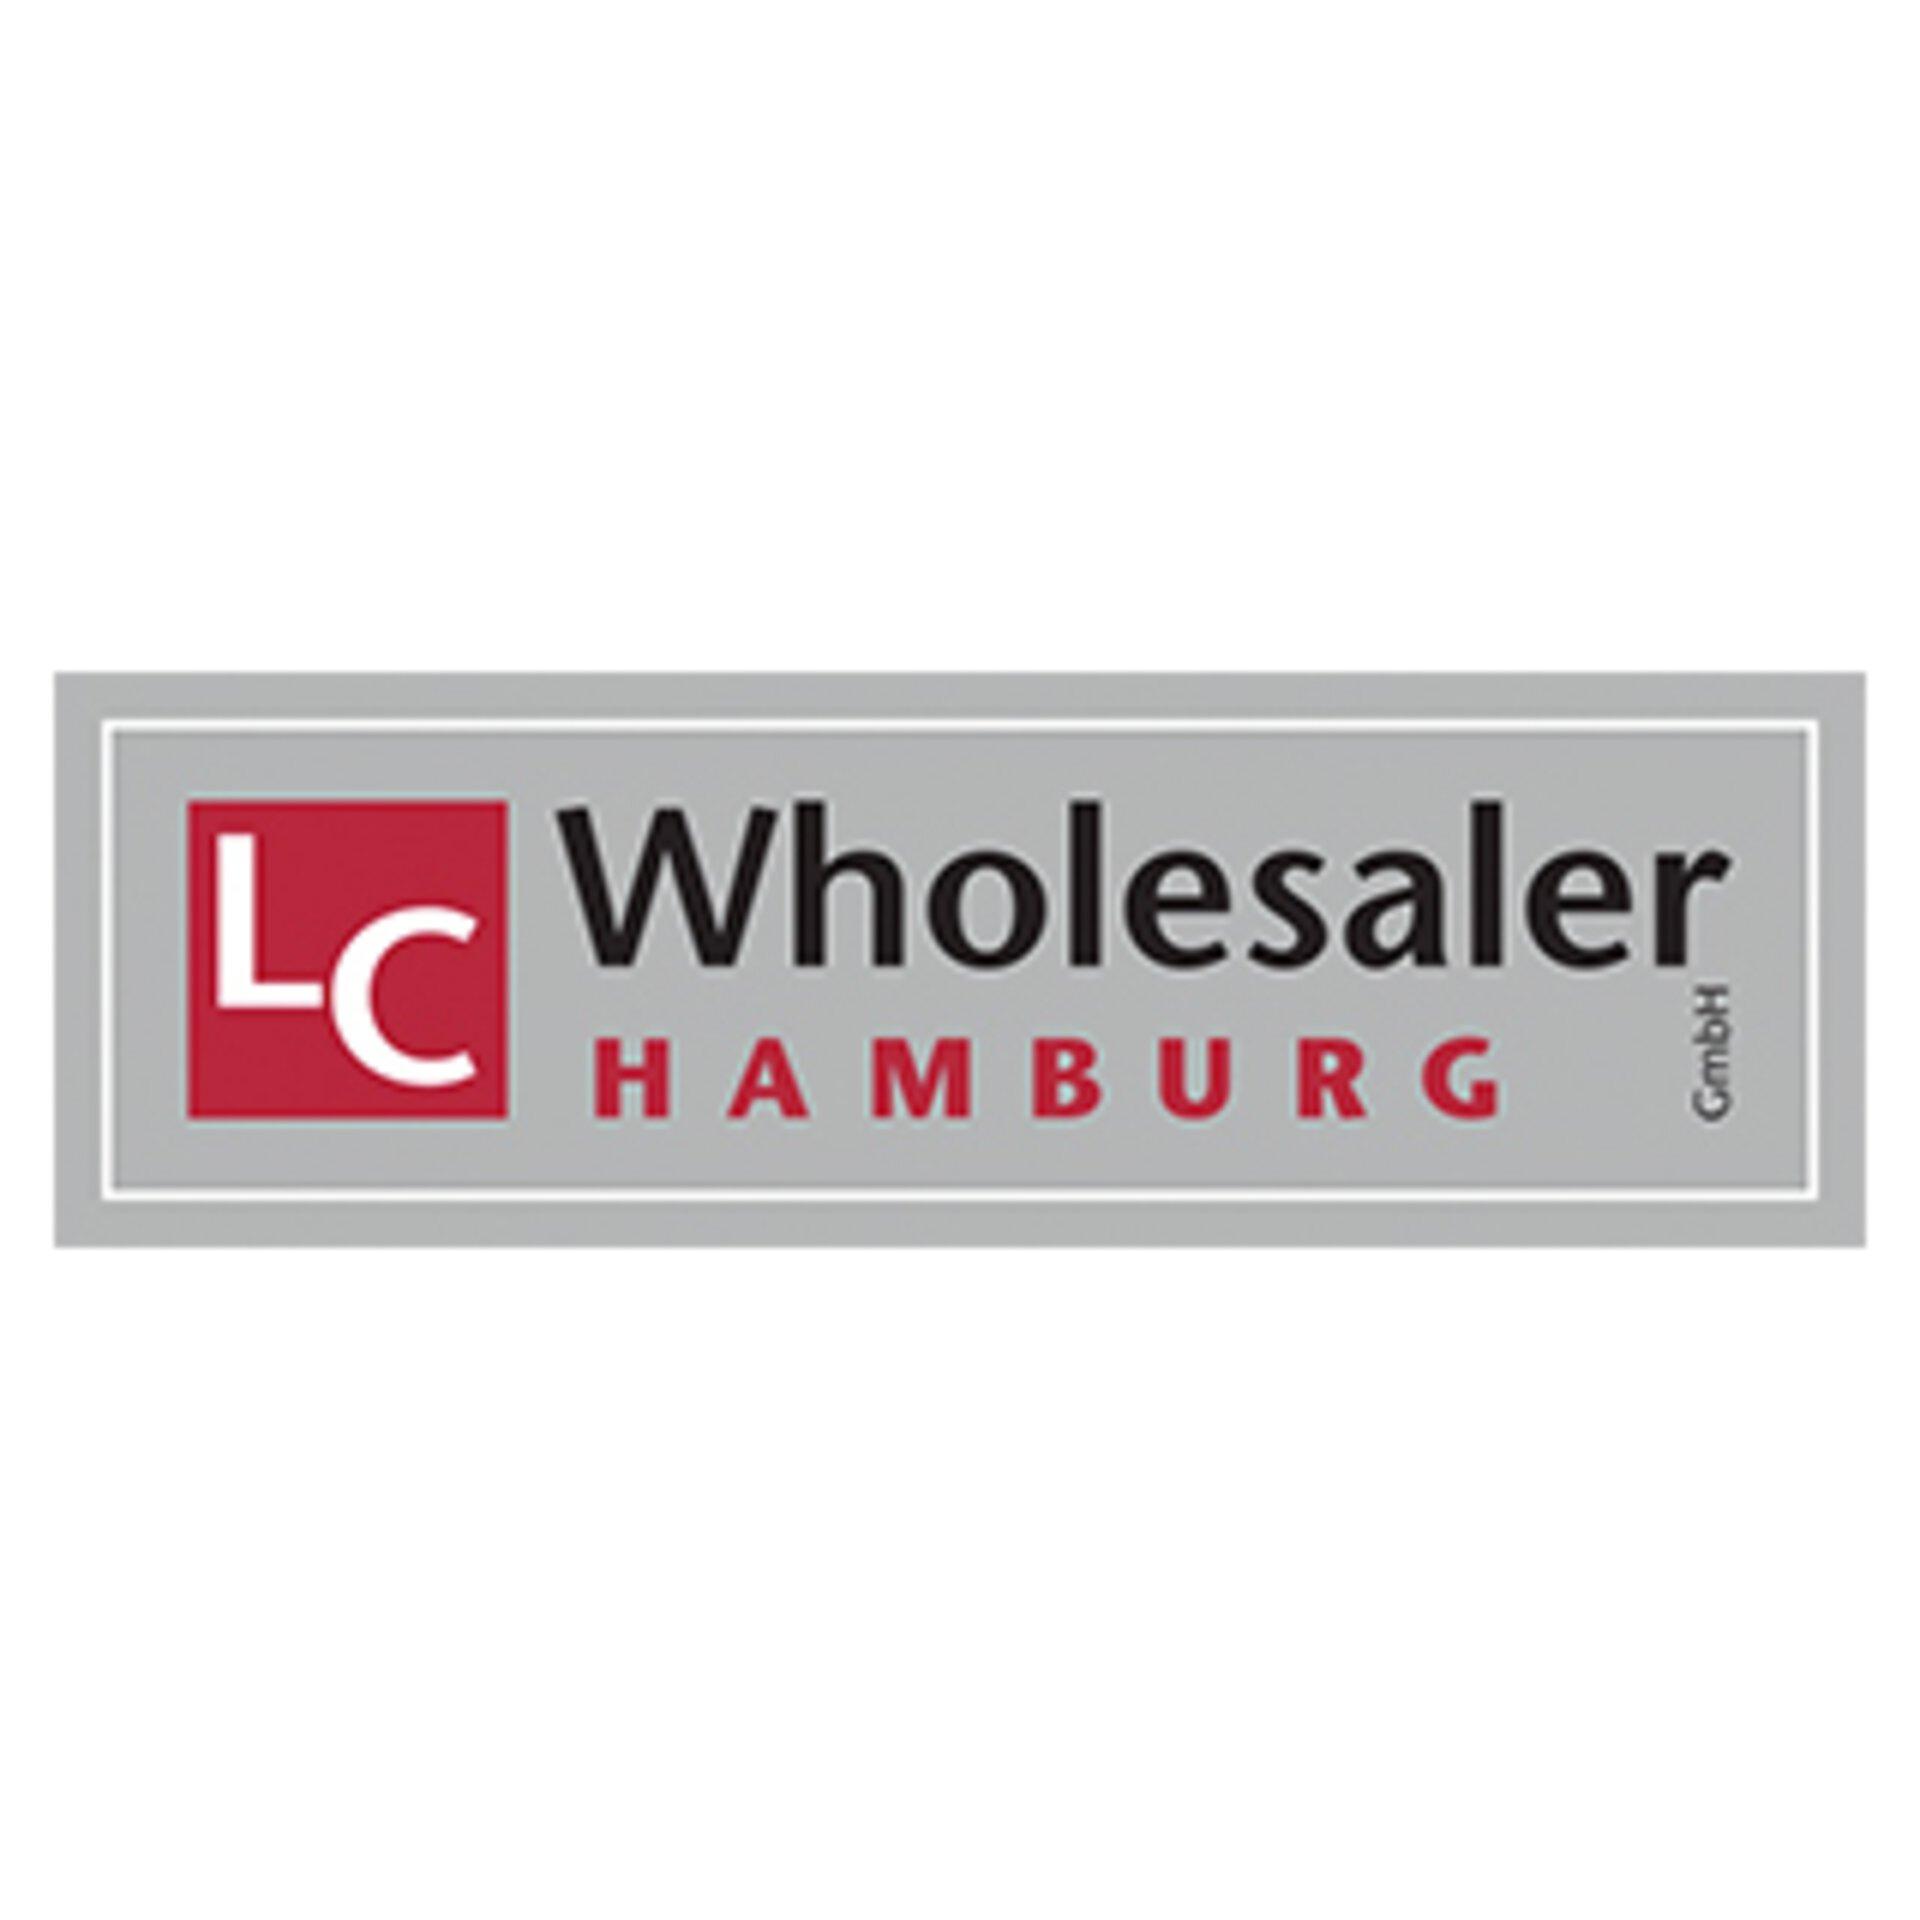 LC Wholesaler